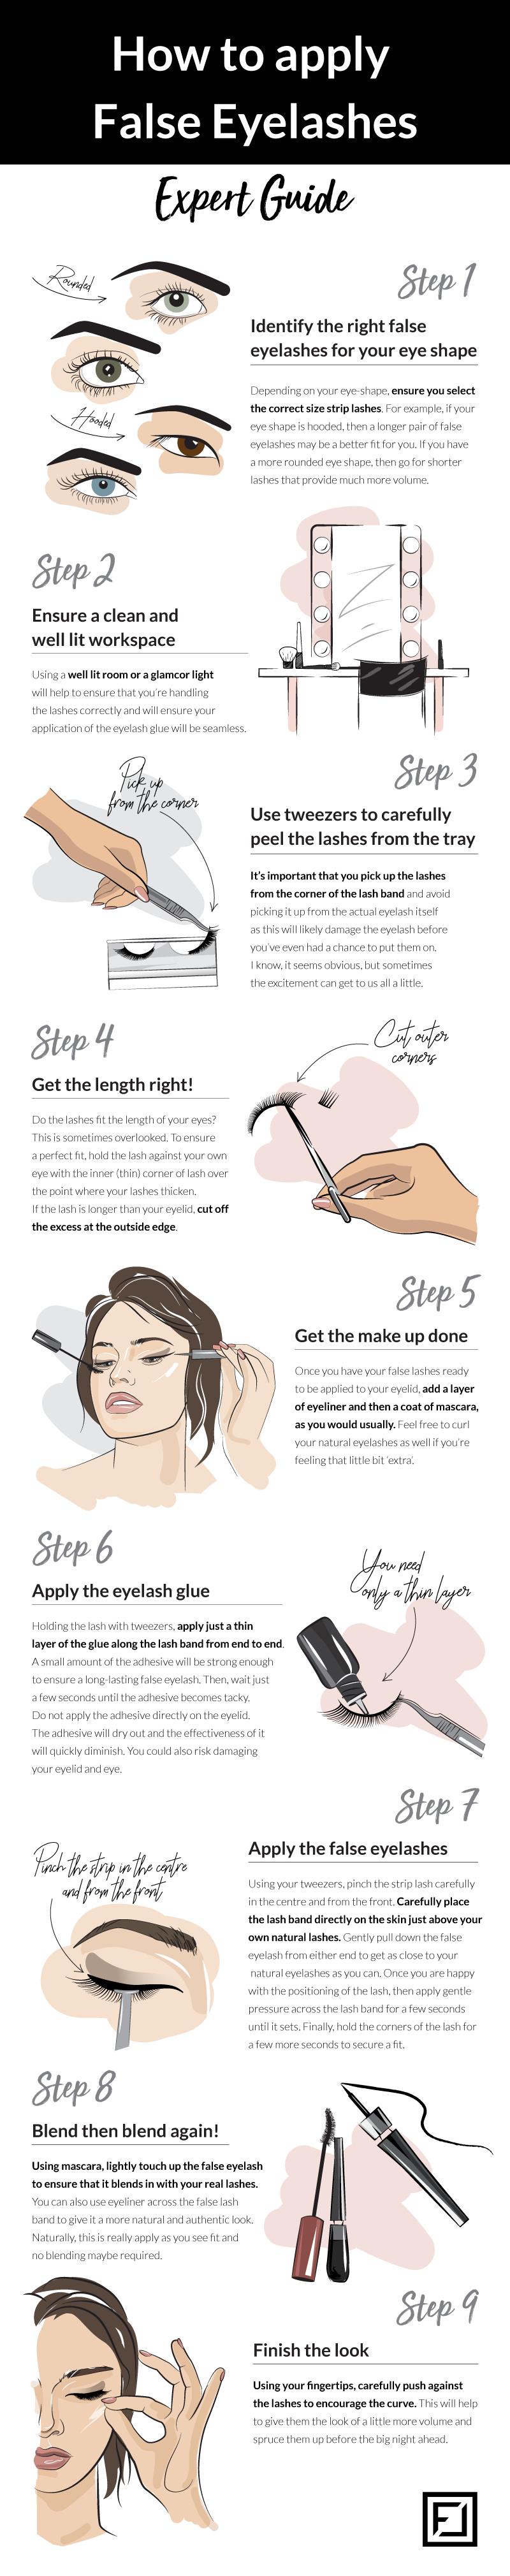 How to Apply False Eyelashes from Flawless Lashes by Loreta